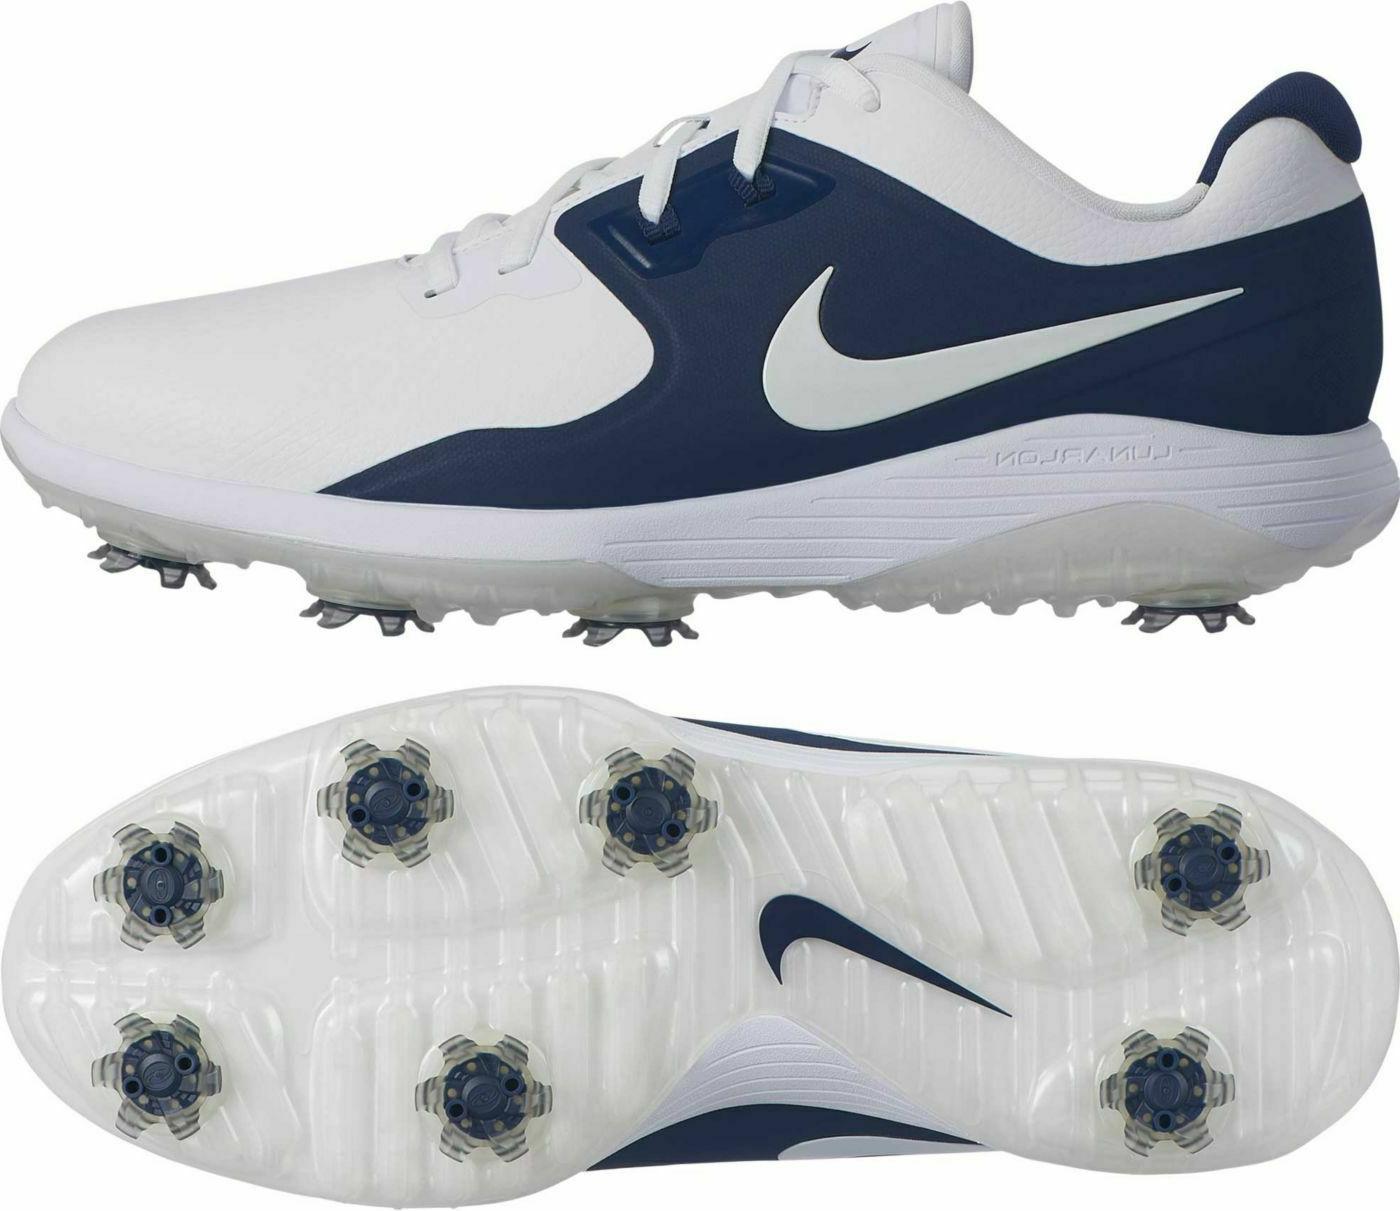 new vapor pro wide men s golf